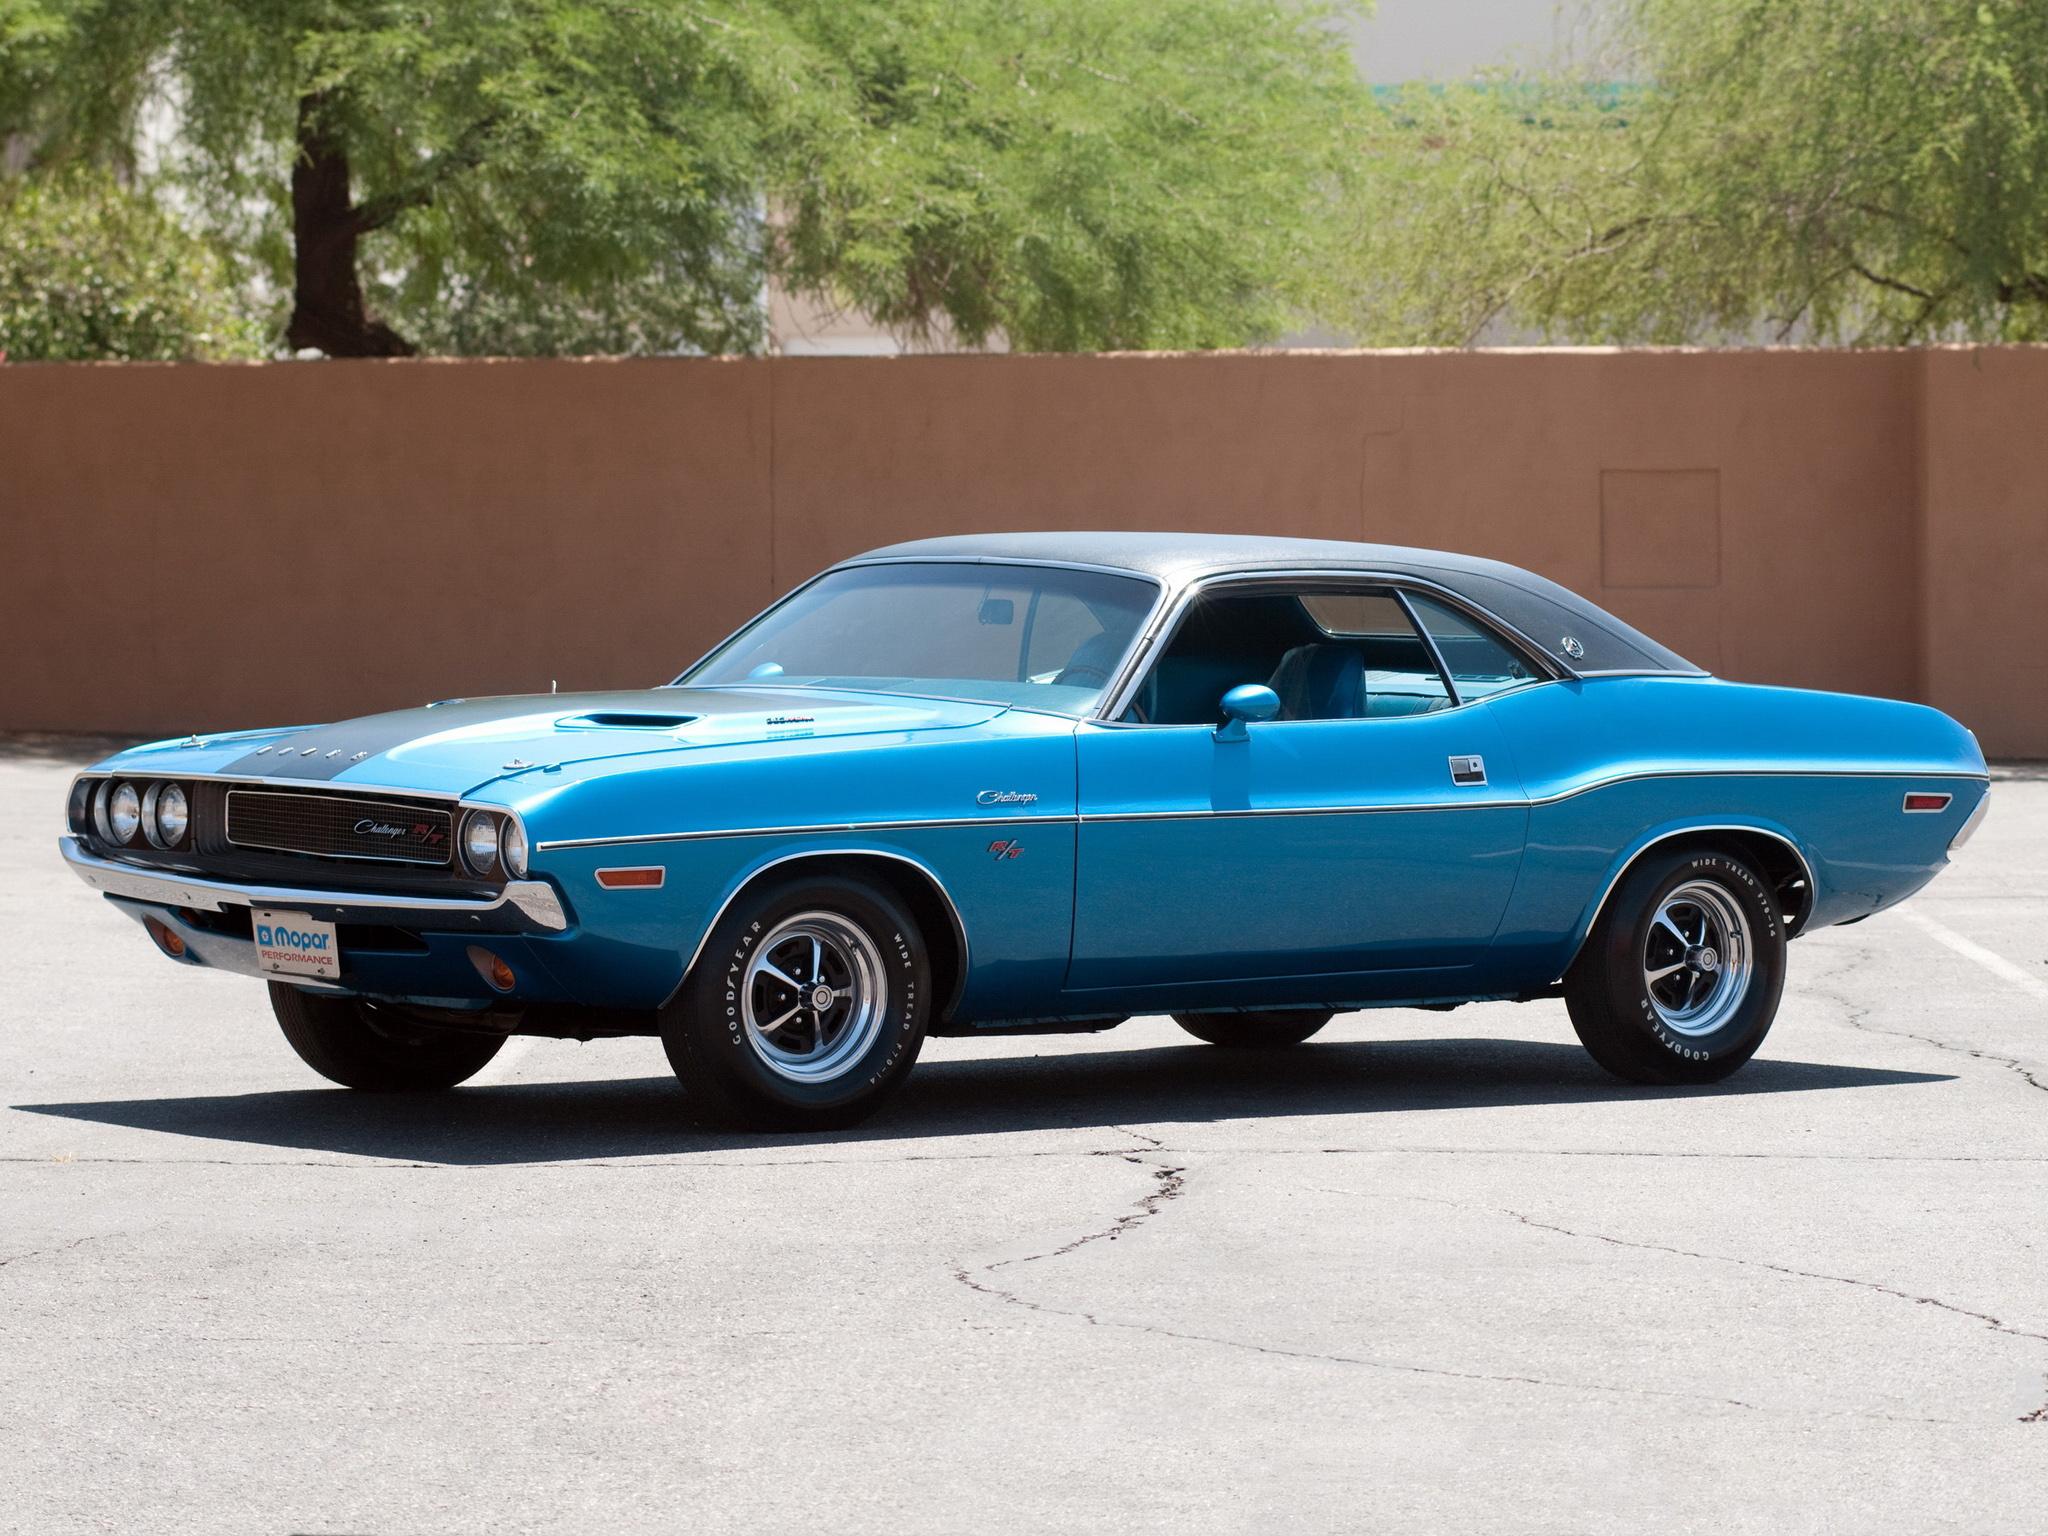 1970 Dodge Challenger R T S E muscle classic d wallpaper 2048x1536 2048x1536